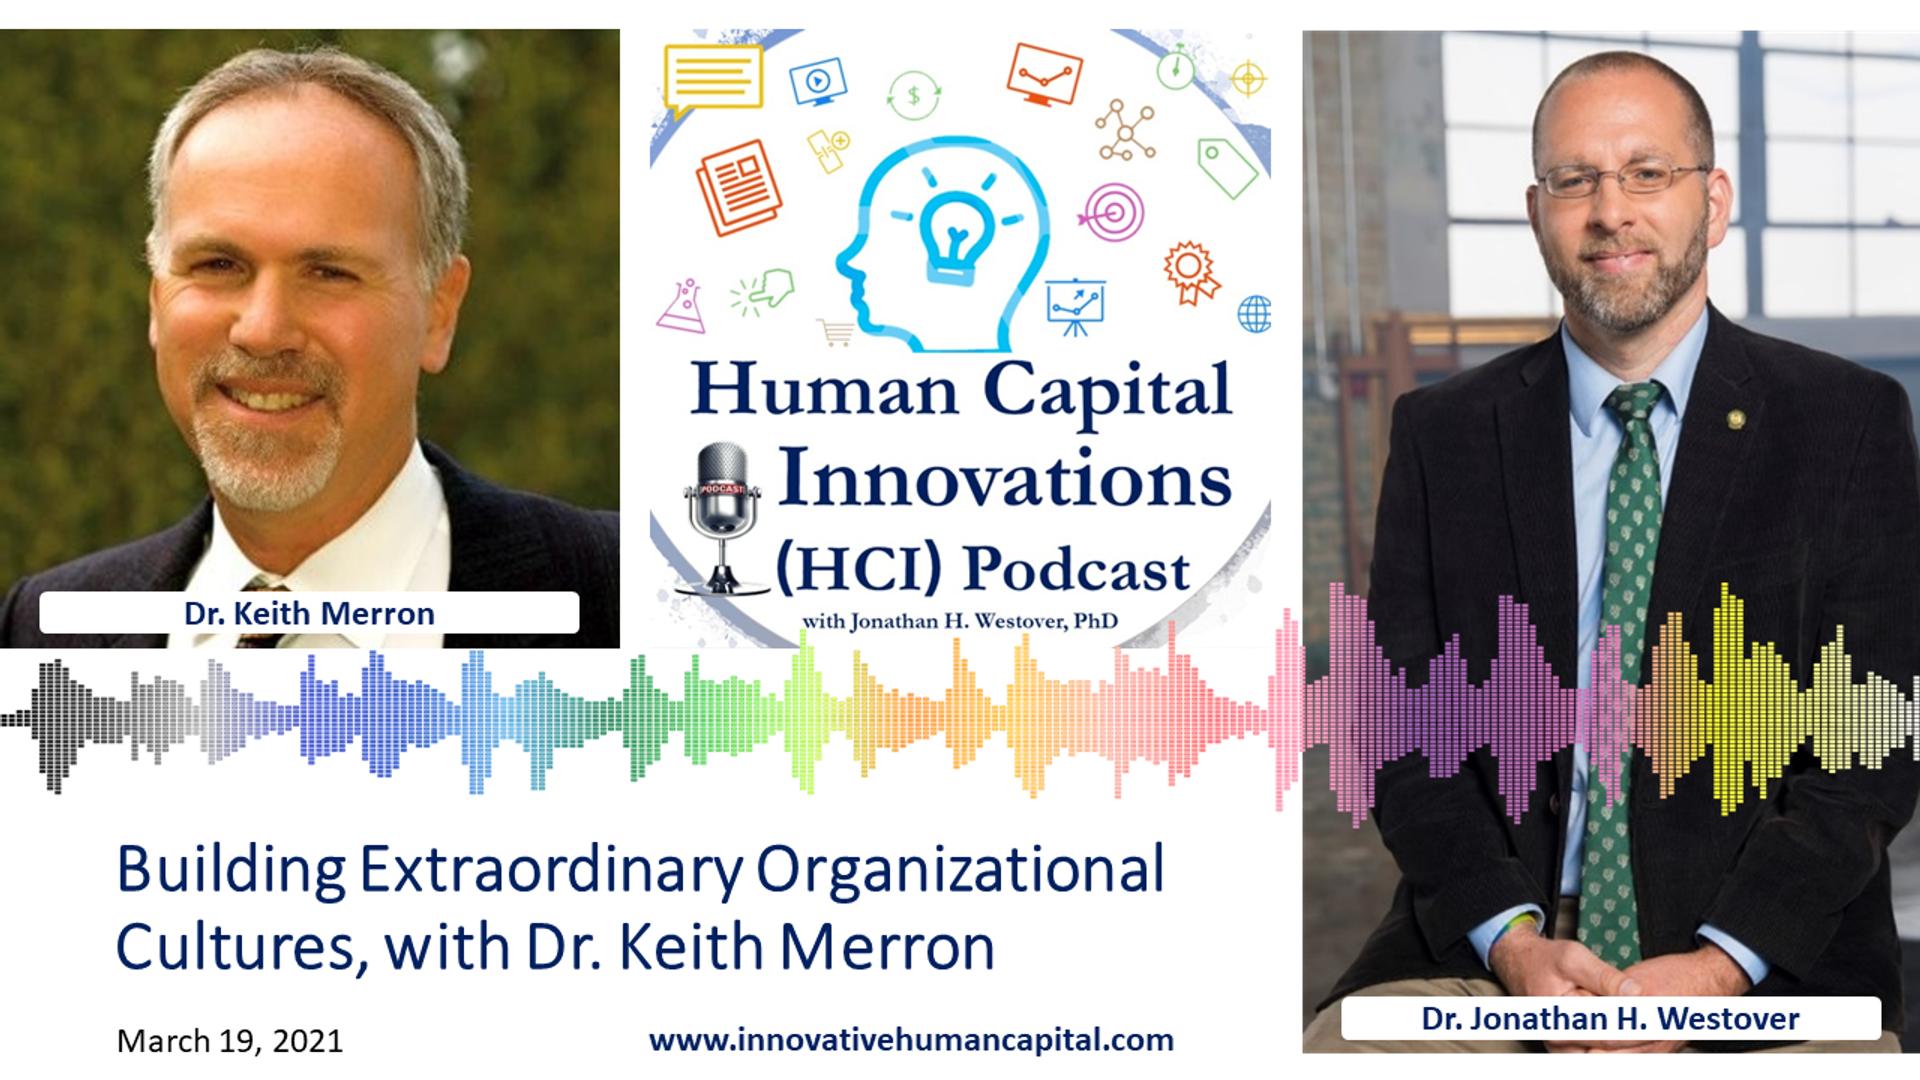 Building Extraordinary Organizational Cultures